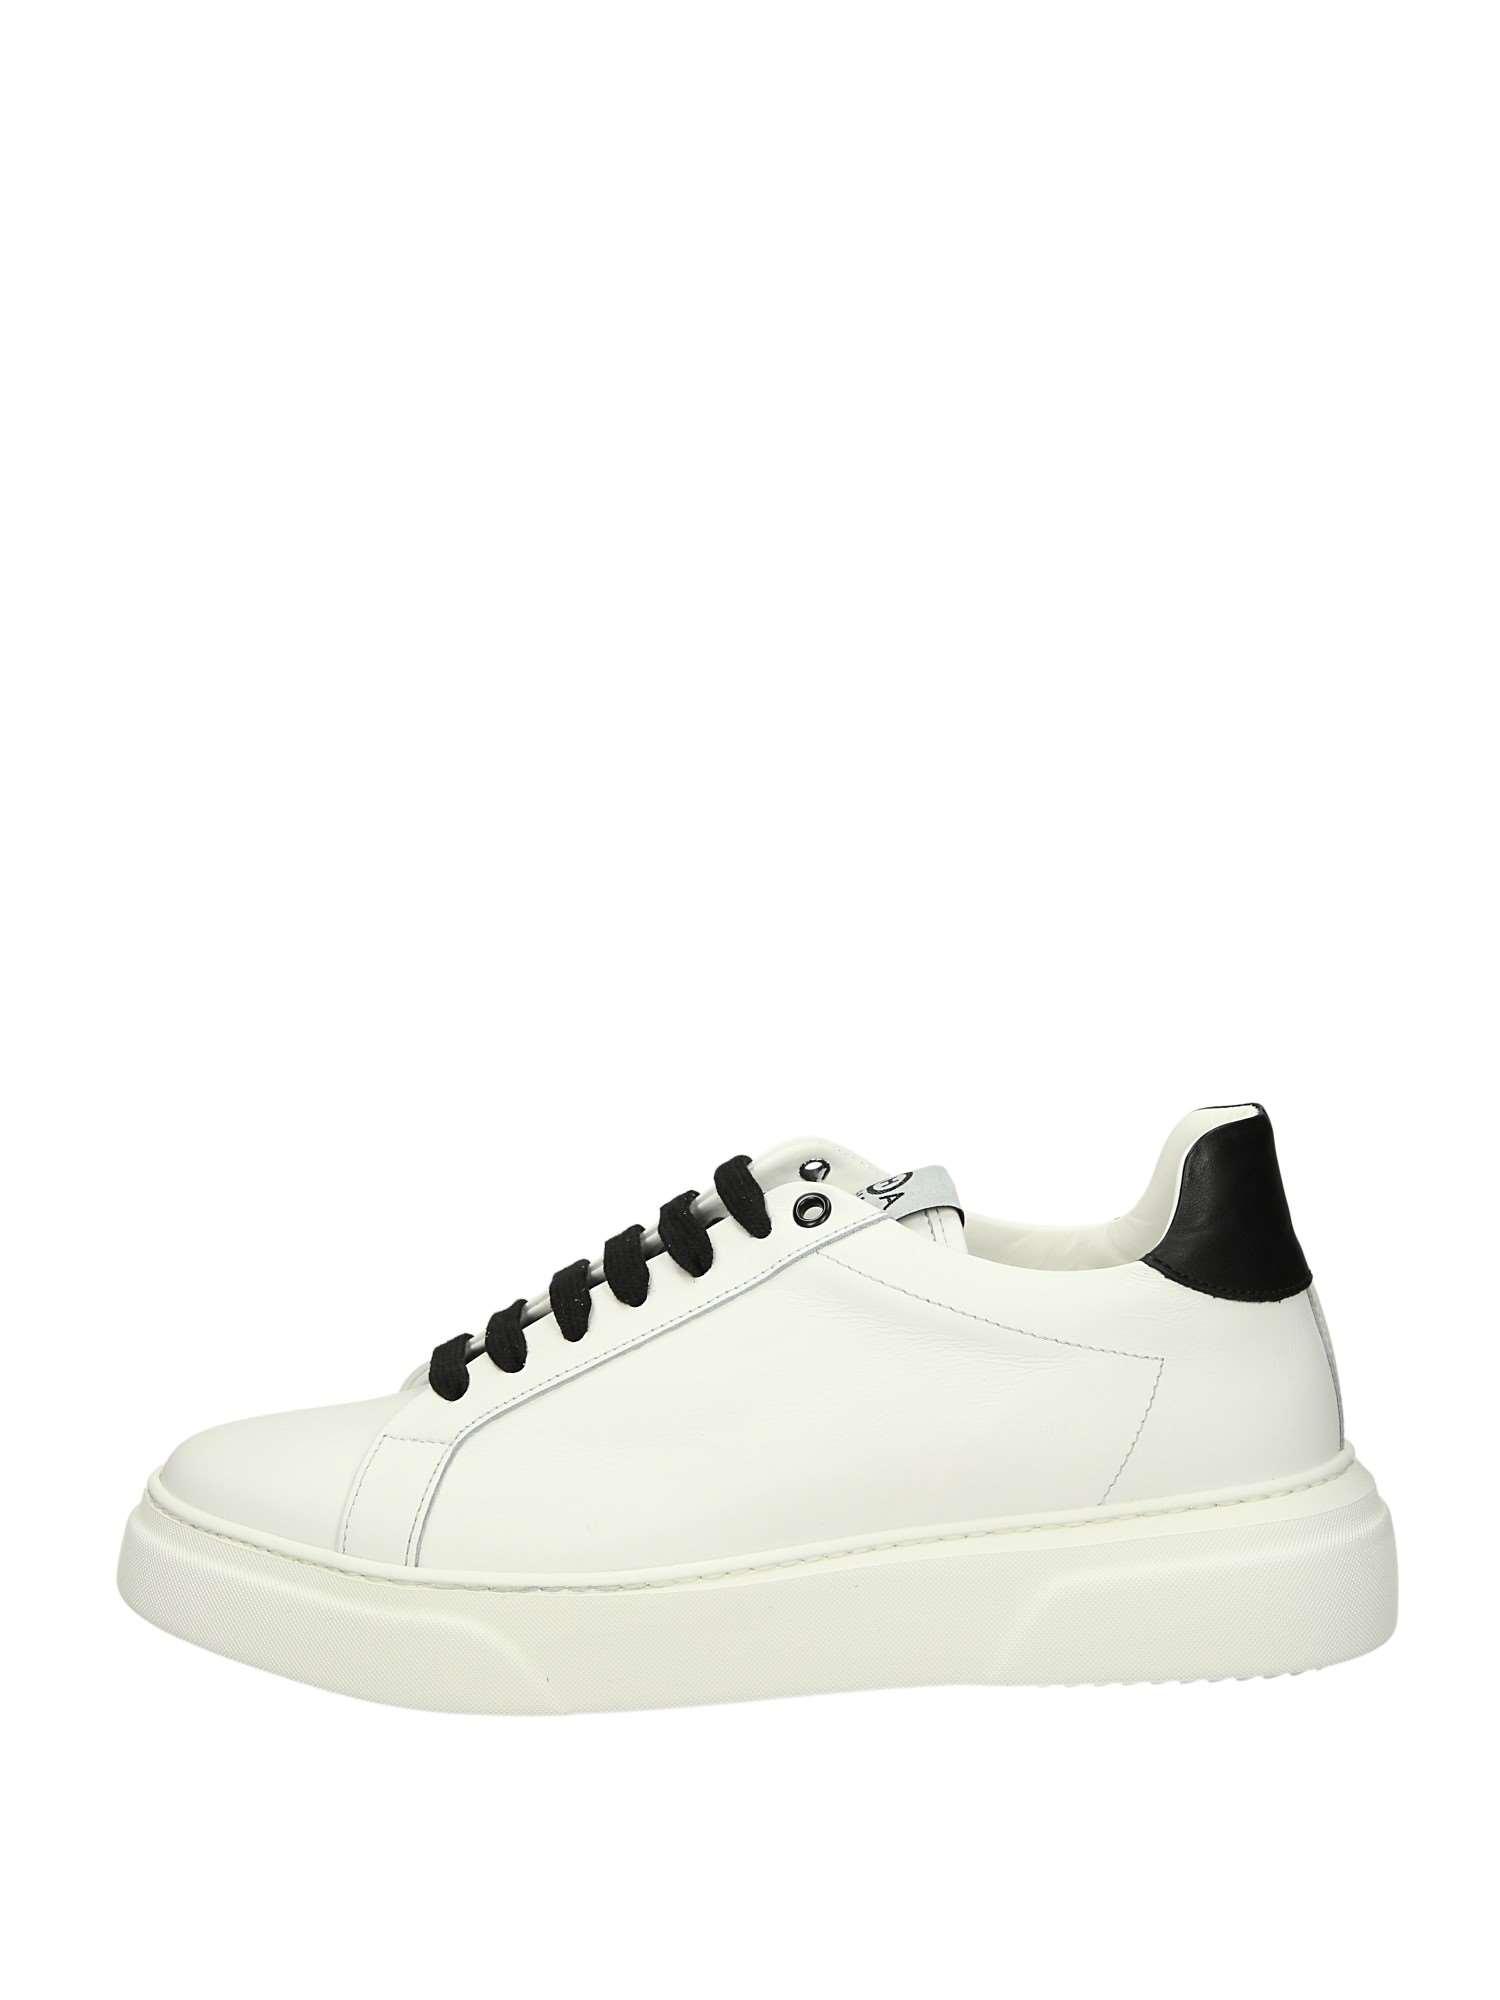 qBxwOAff Pha Paris Man Lalilina Low Sneakers White deserving xXvz7Yq